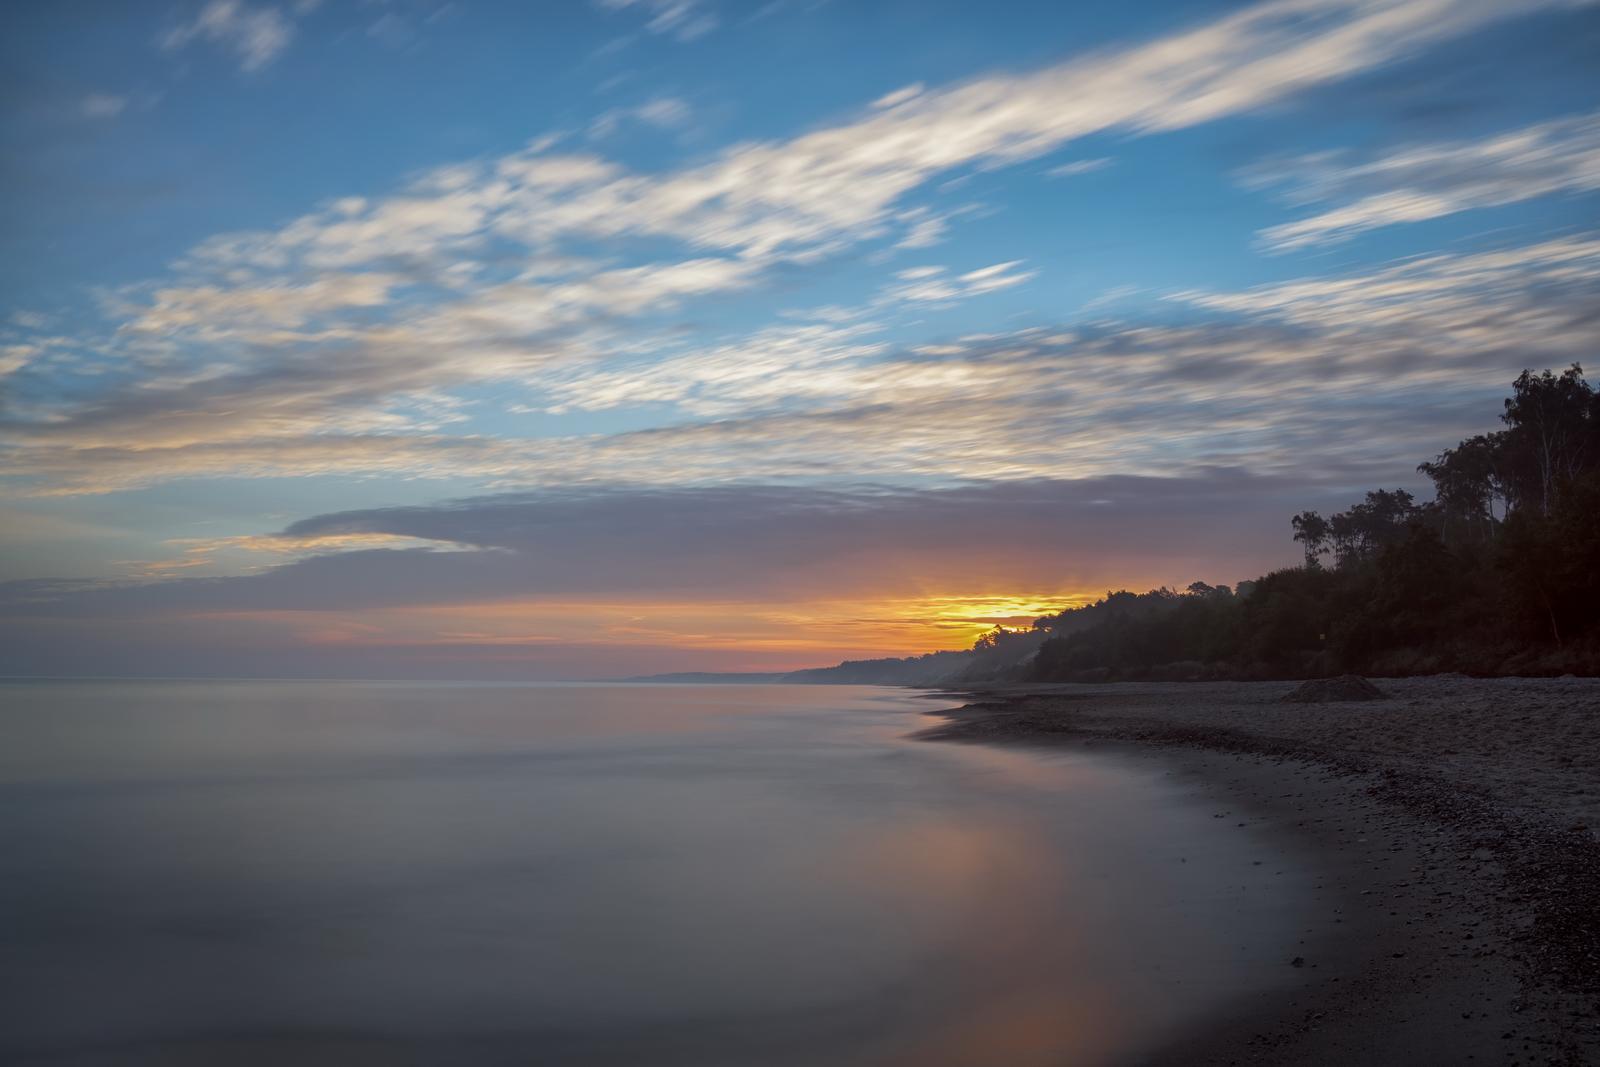 Sunrise – Photograph shows sunrise in Ustka. Waking up at 4am was fully rewarded. Fuji XPro-2, XF 50-140, 83s, f8, ISO 100, Hitech ND10